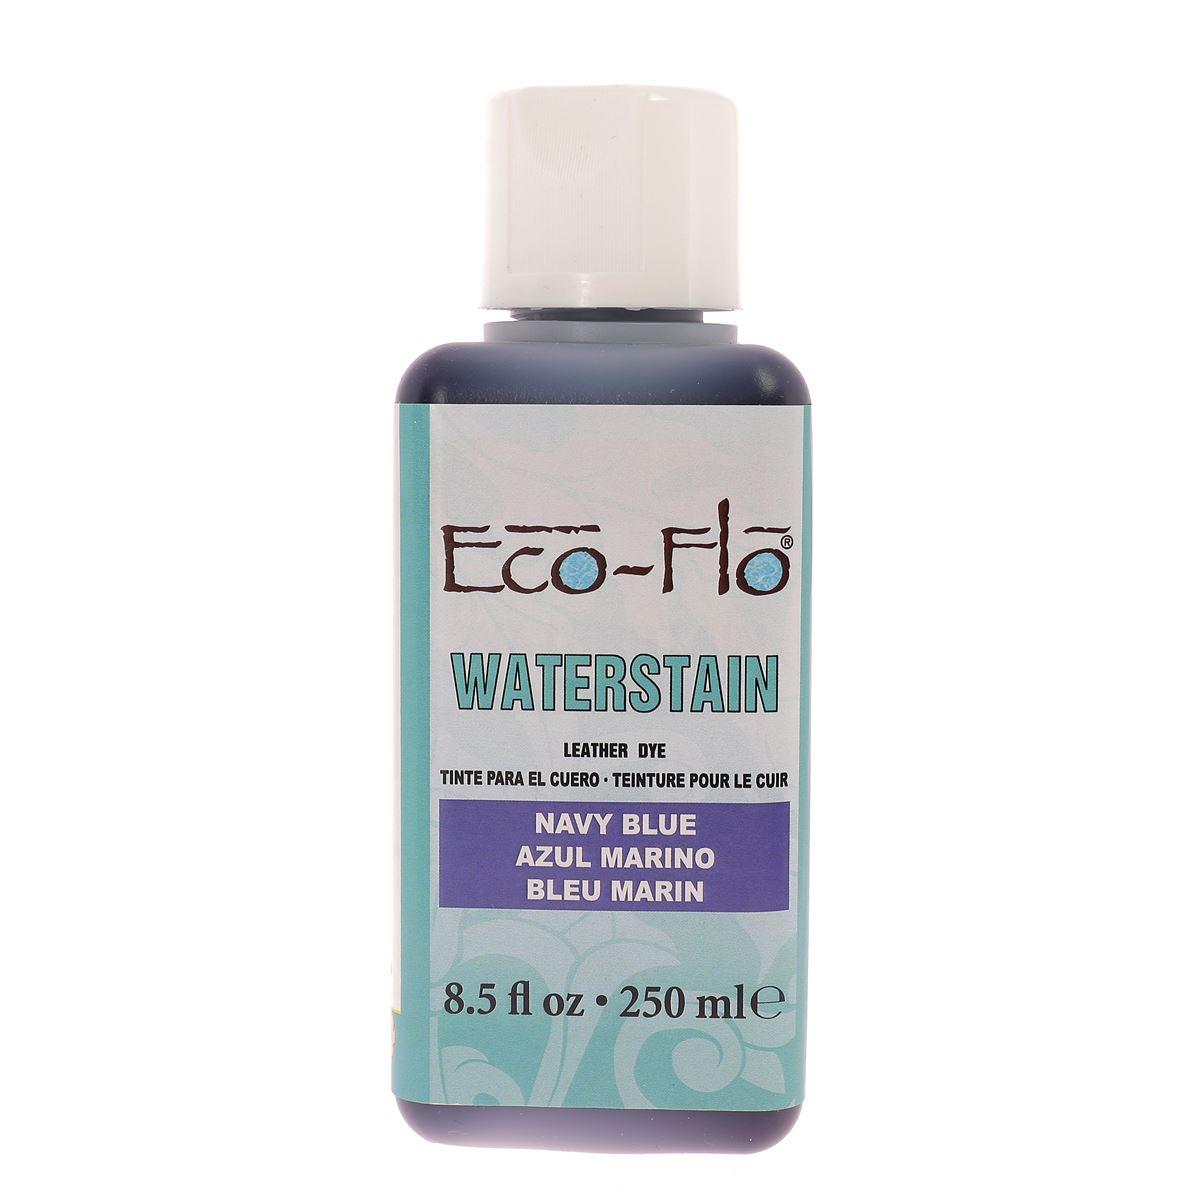 Teinture ECO-FLO WATERSTAIN - BLEU MARINE / NAVY BLUE - 250 ml